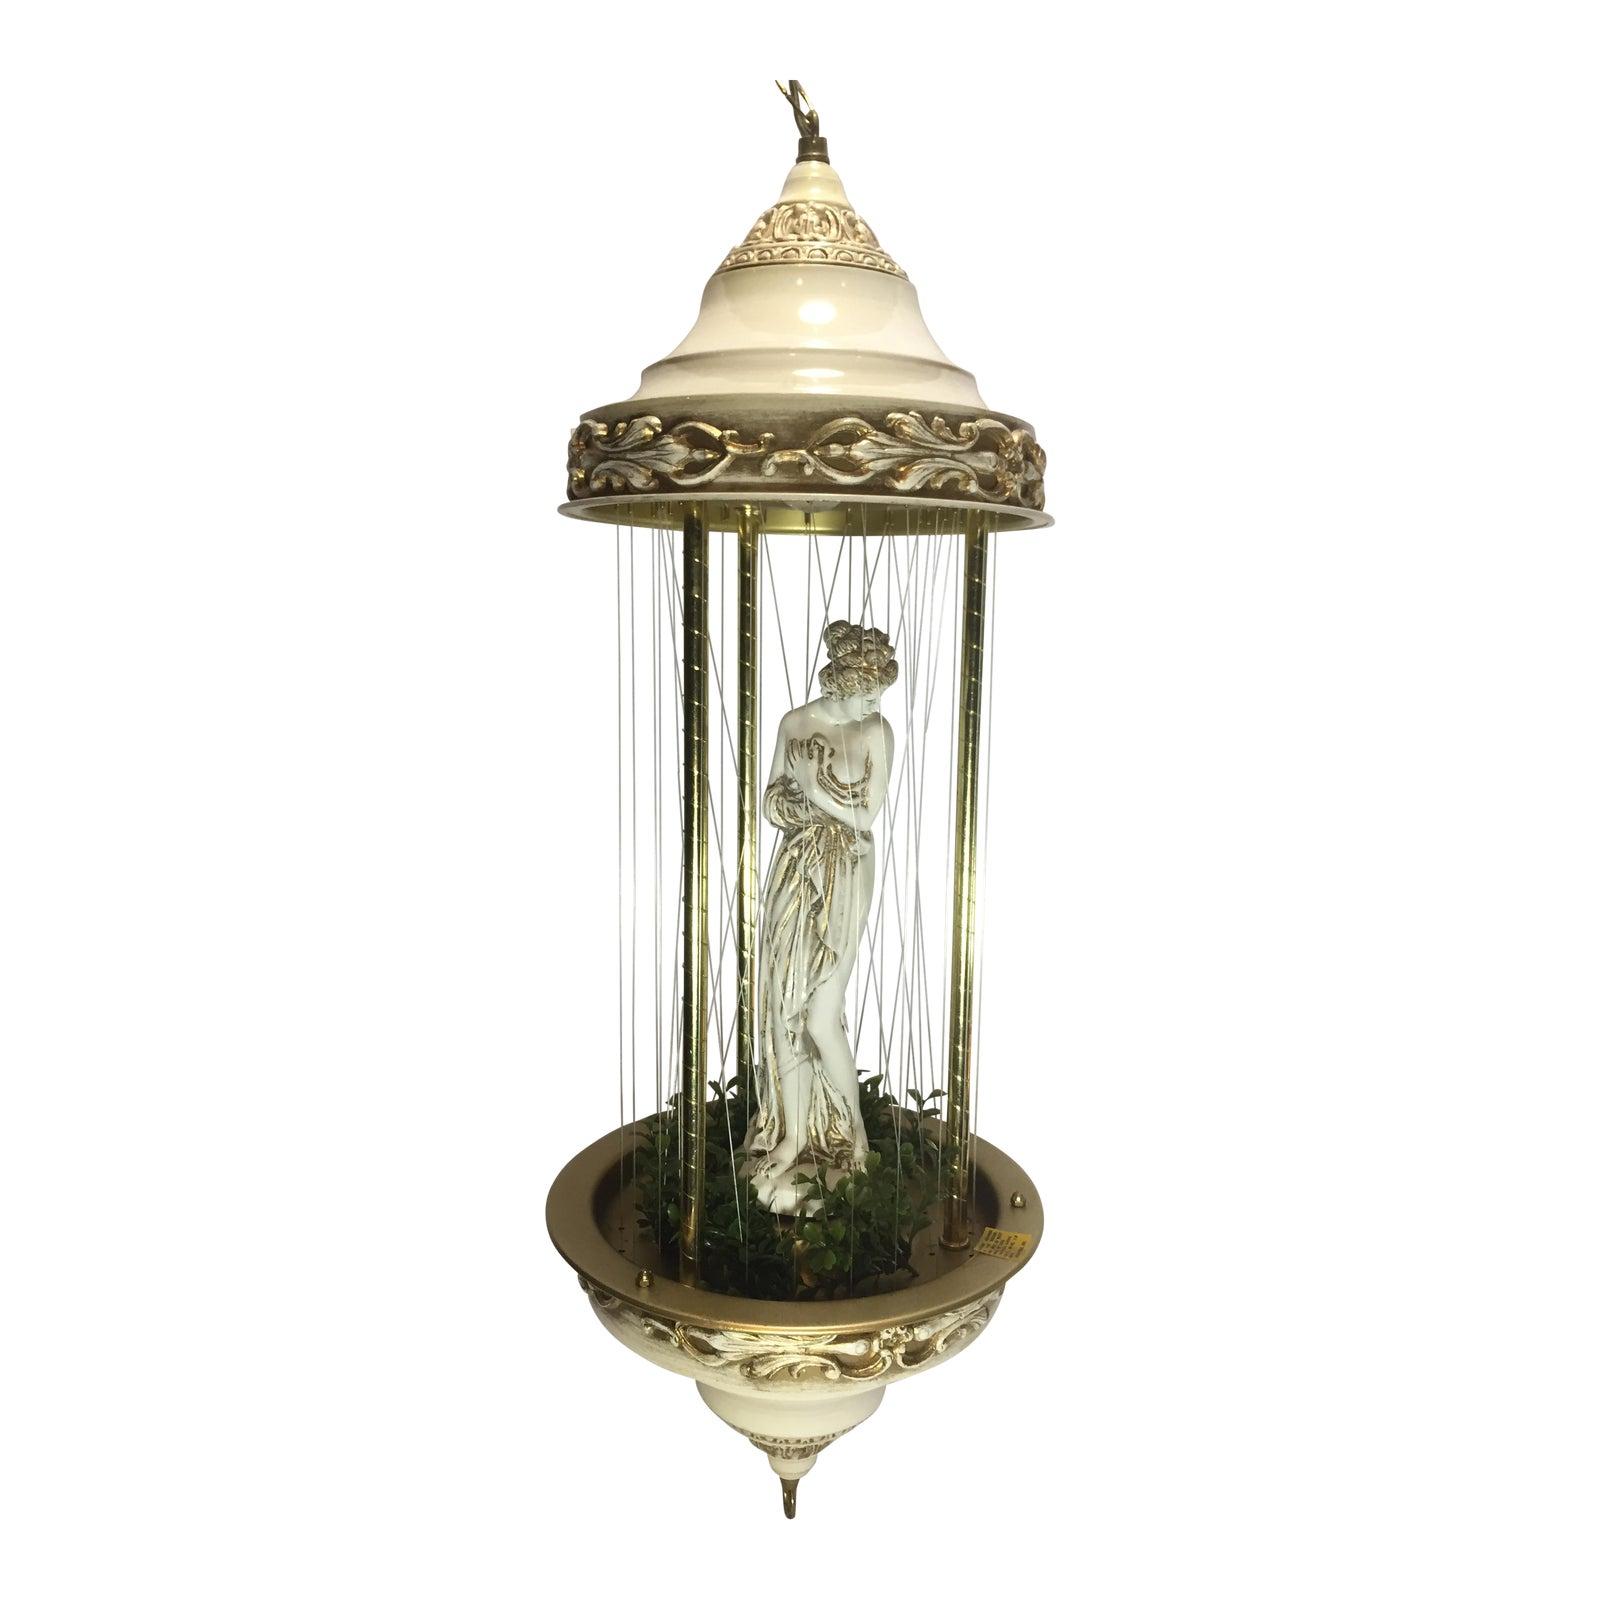 Vintage hanging oil rain swag lamp with goddess